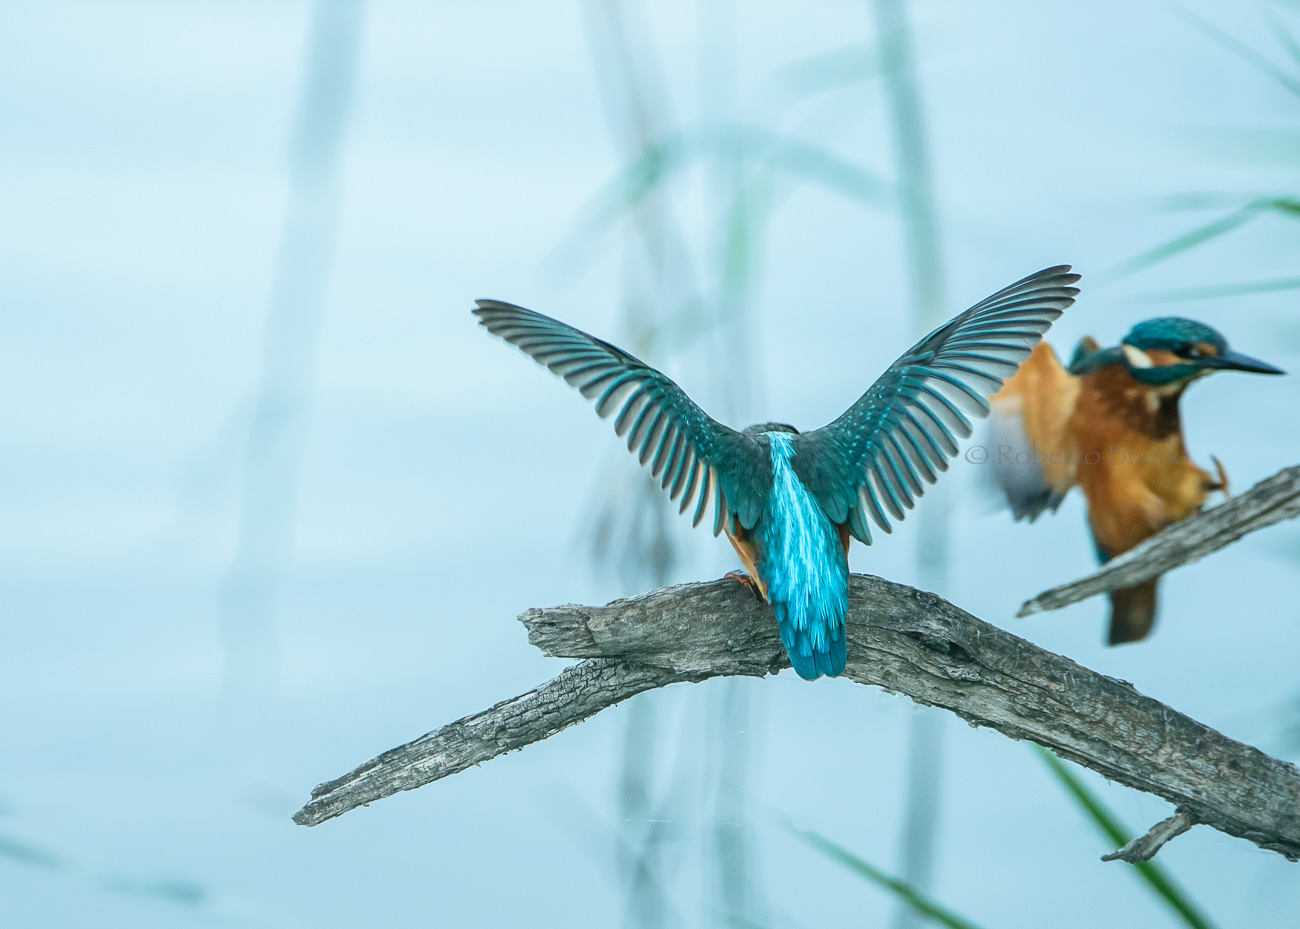 Martín pescador (Alcedo atthis) - Aves - www.robertobueno.com, Luces del planeta